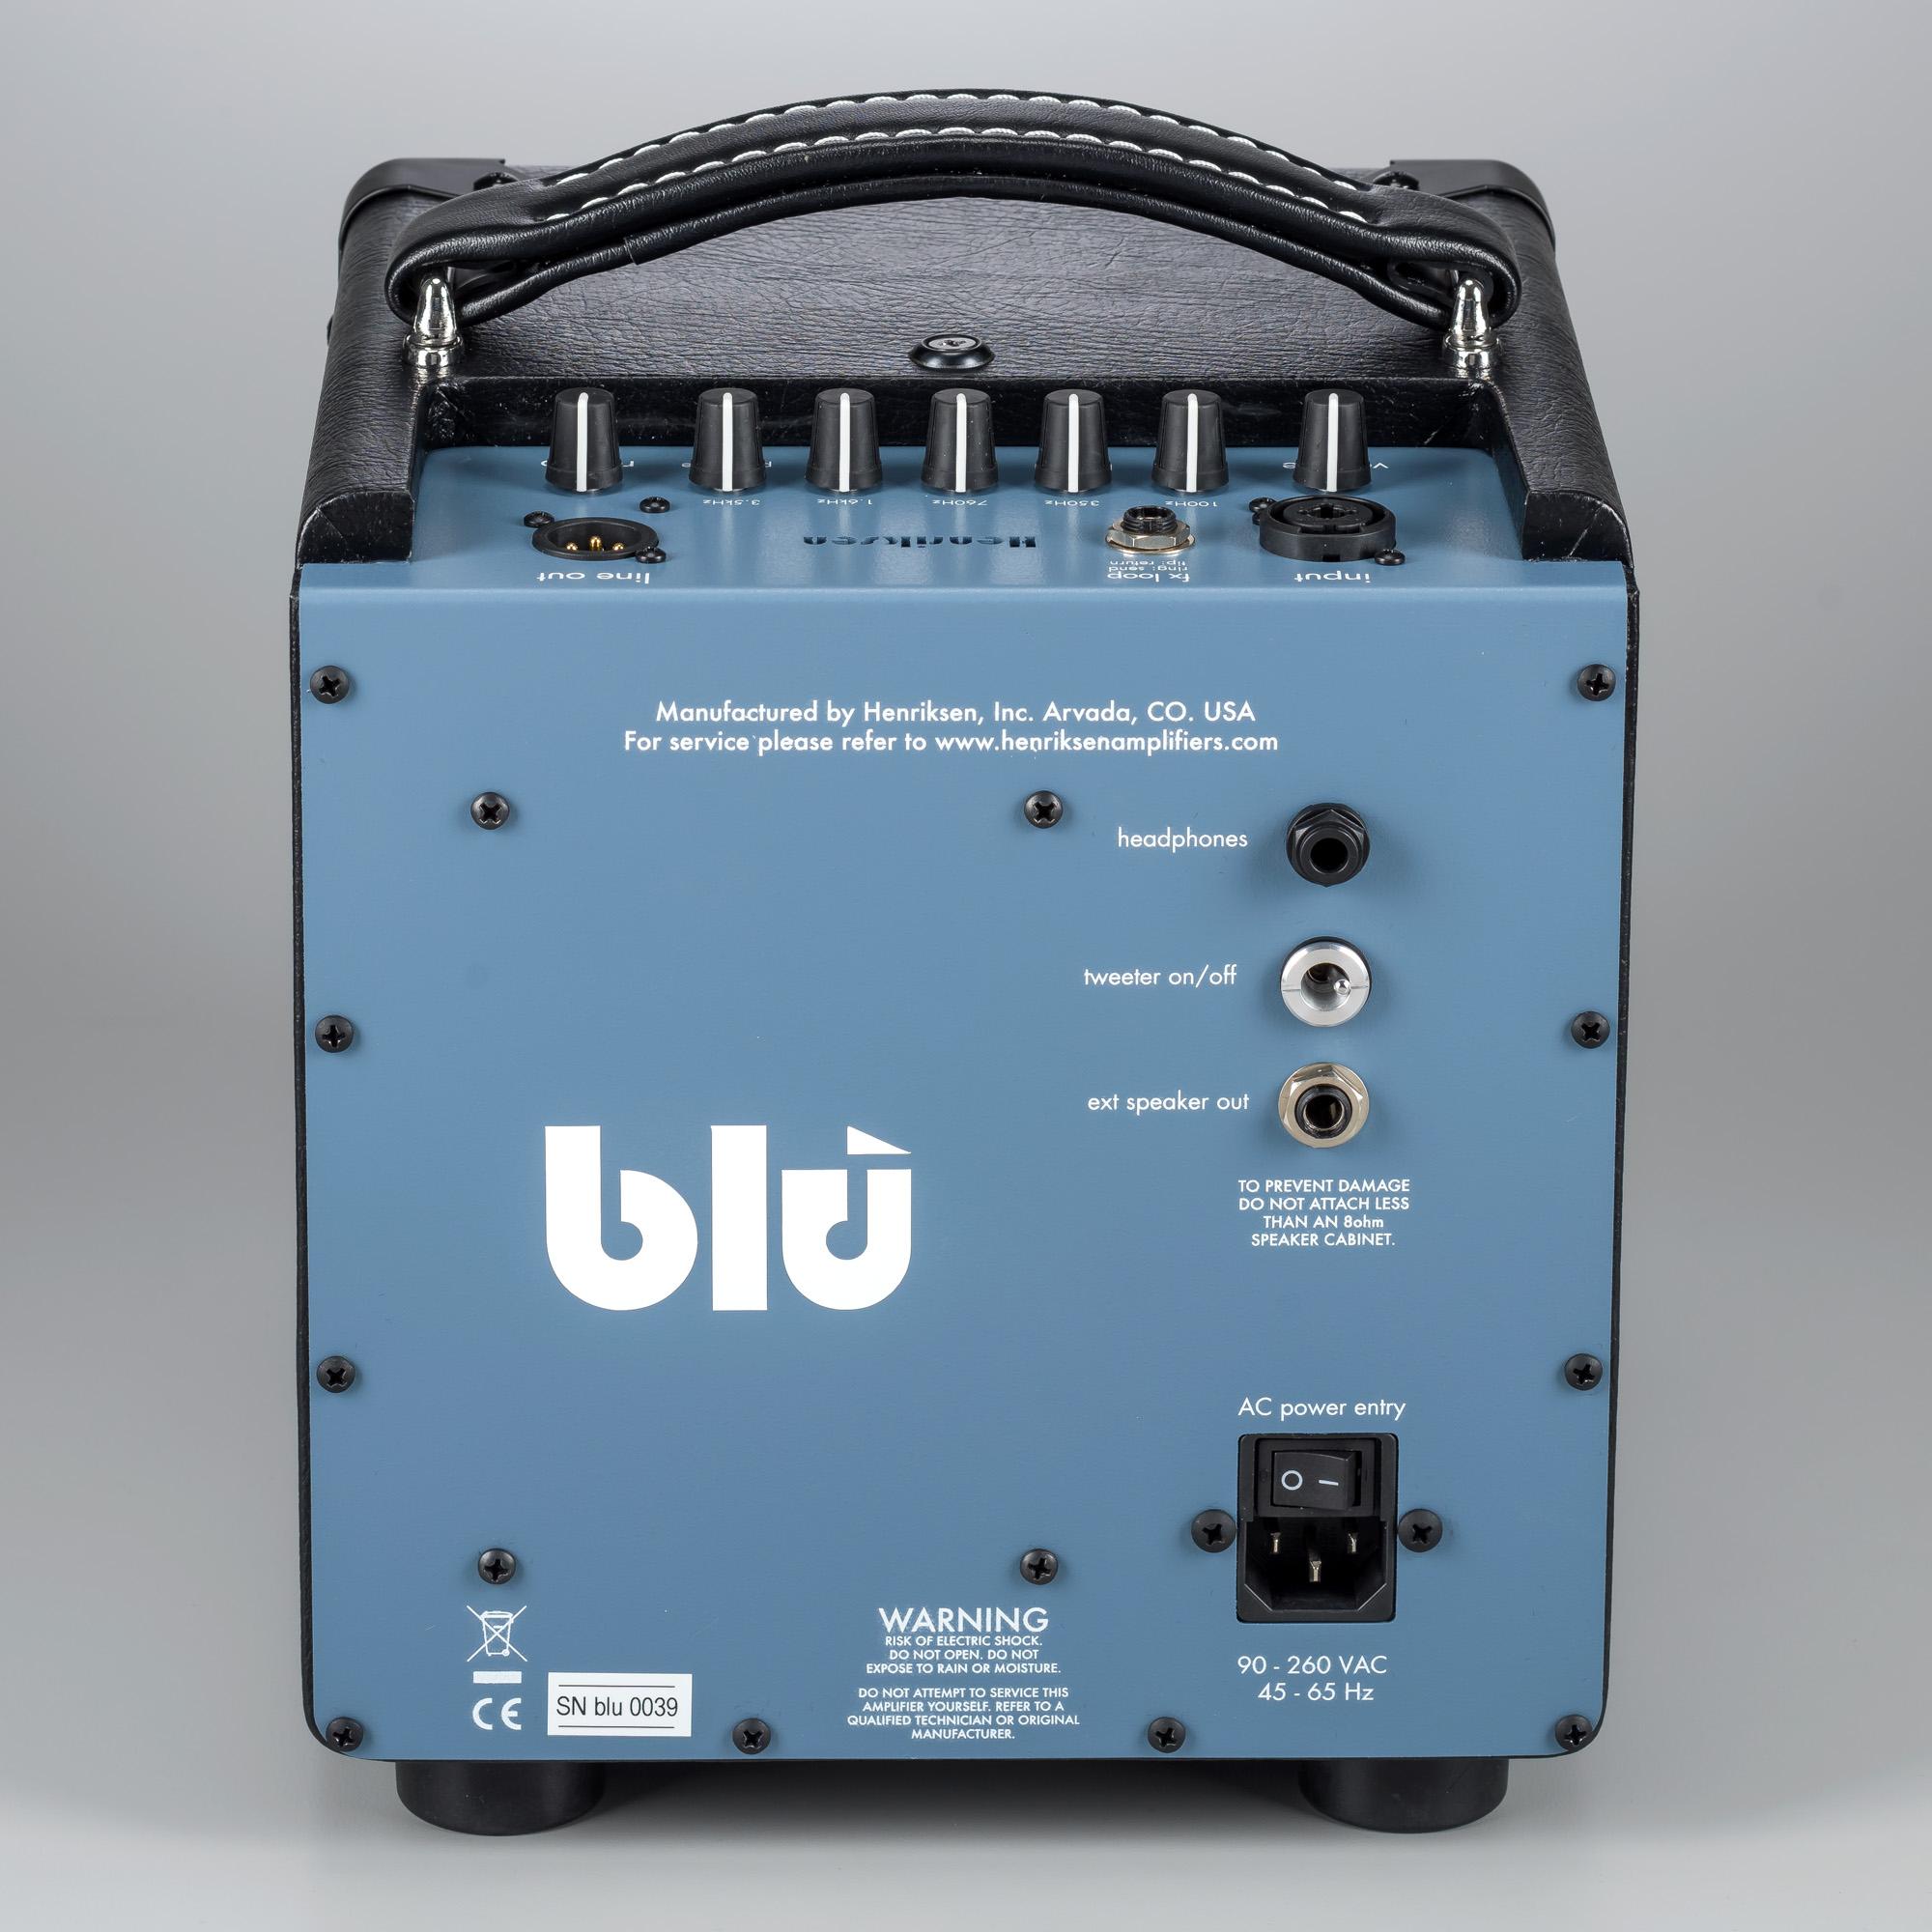 [AG新品]功能强大的单通道功放,可蓝牙连接:Henriksen The Blu